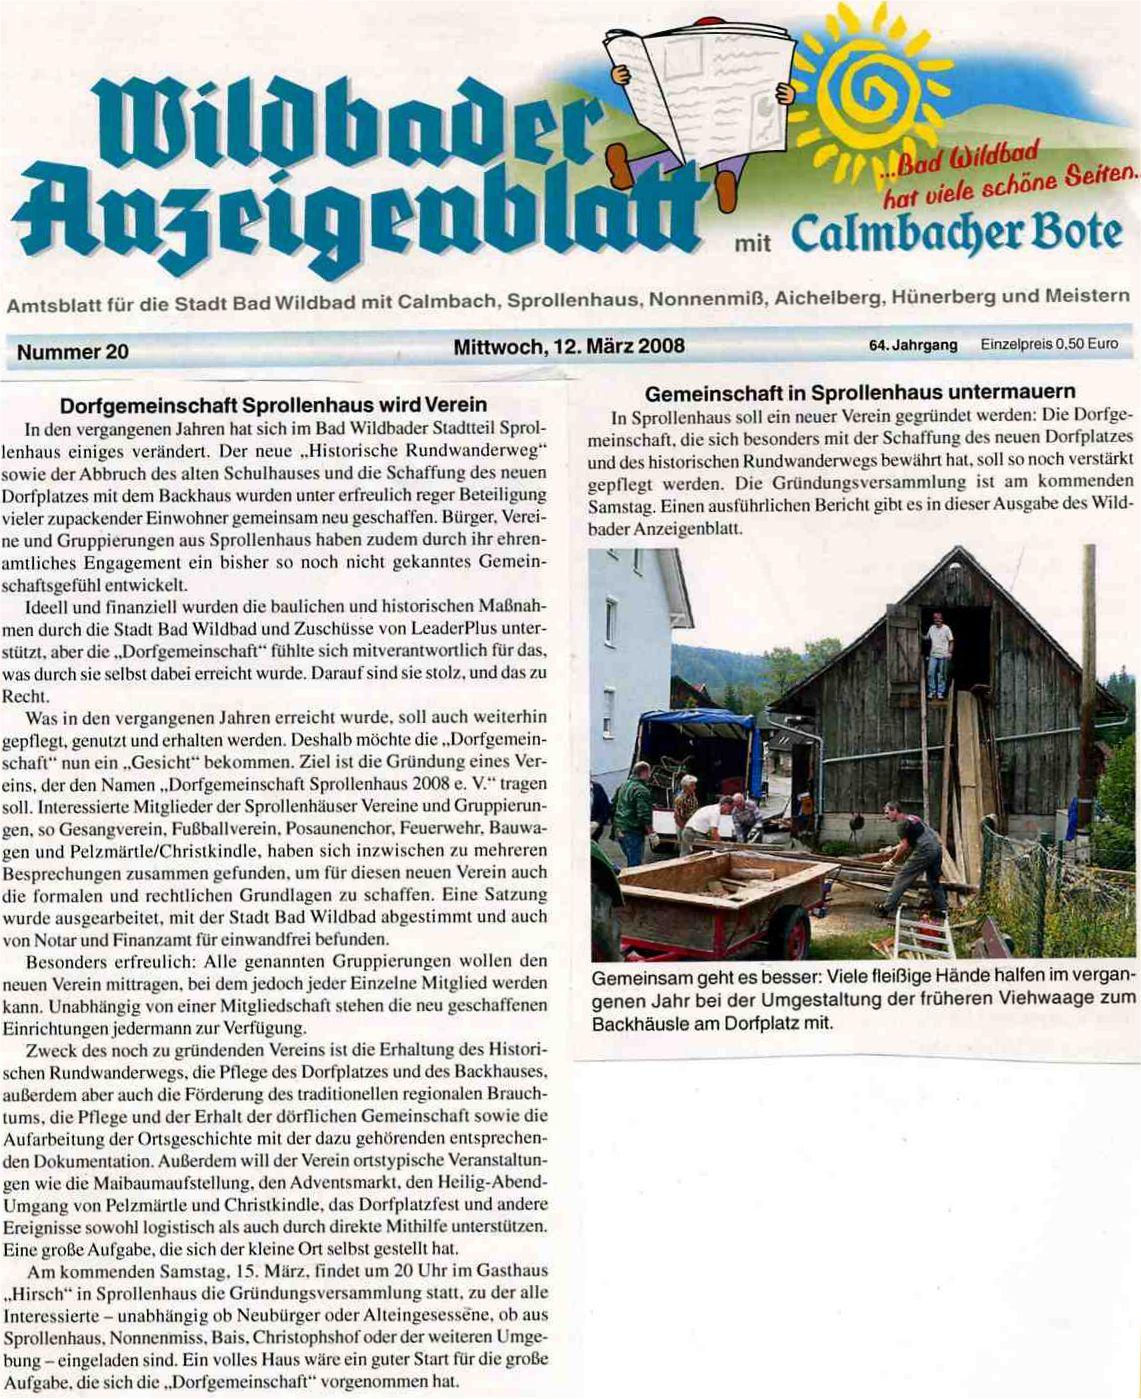 2008-03-15-wildbader_anzeigeblatt-gruendungsversammlung